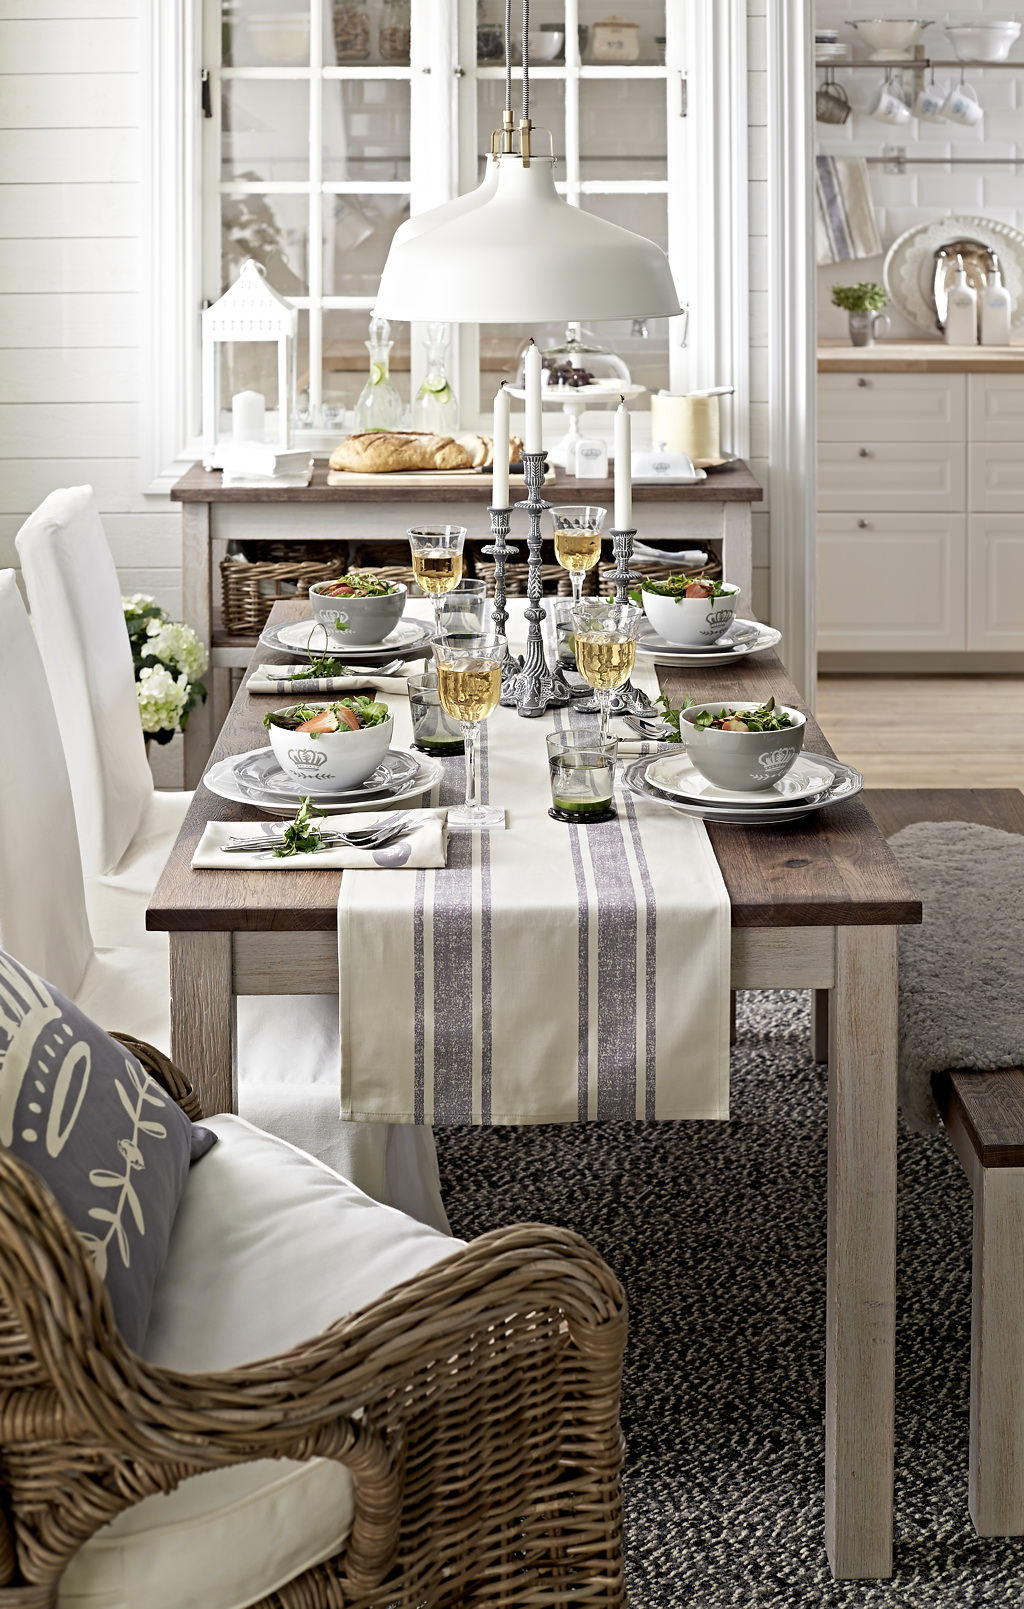 Ikea lim2014 5